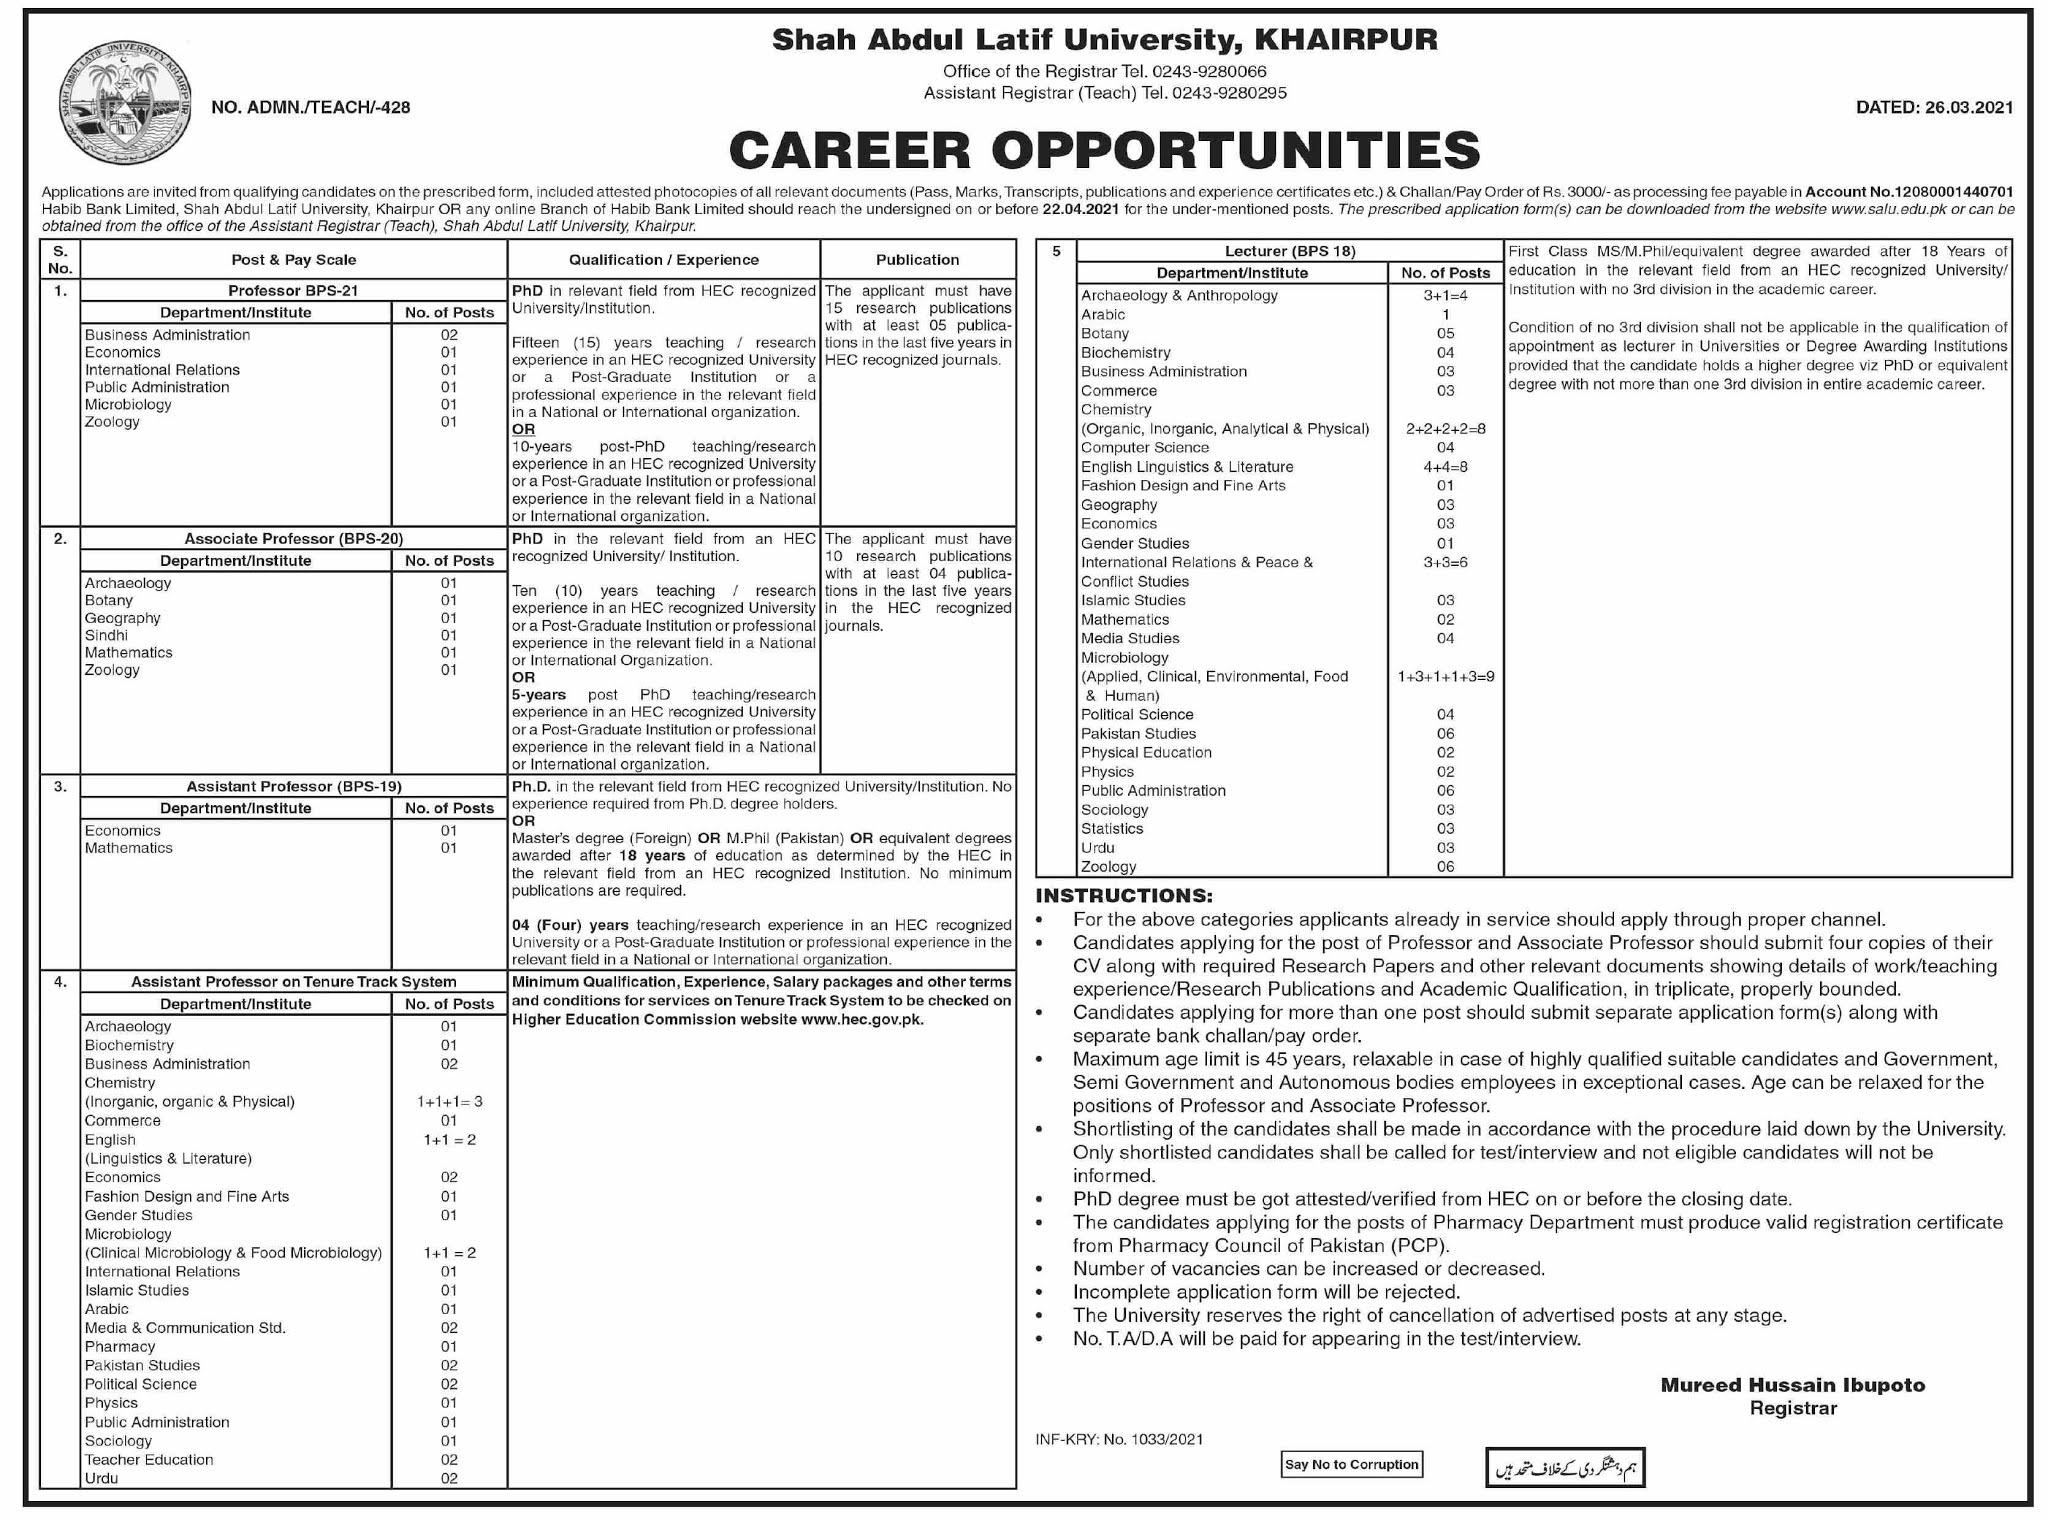 Shah Abdul Latif University Khairpur Jobs 2021 in Pakistan